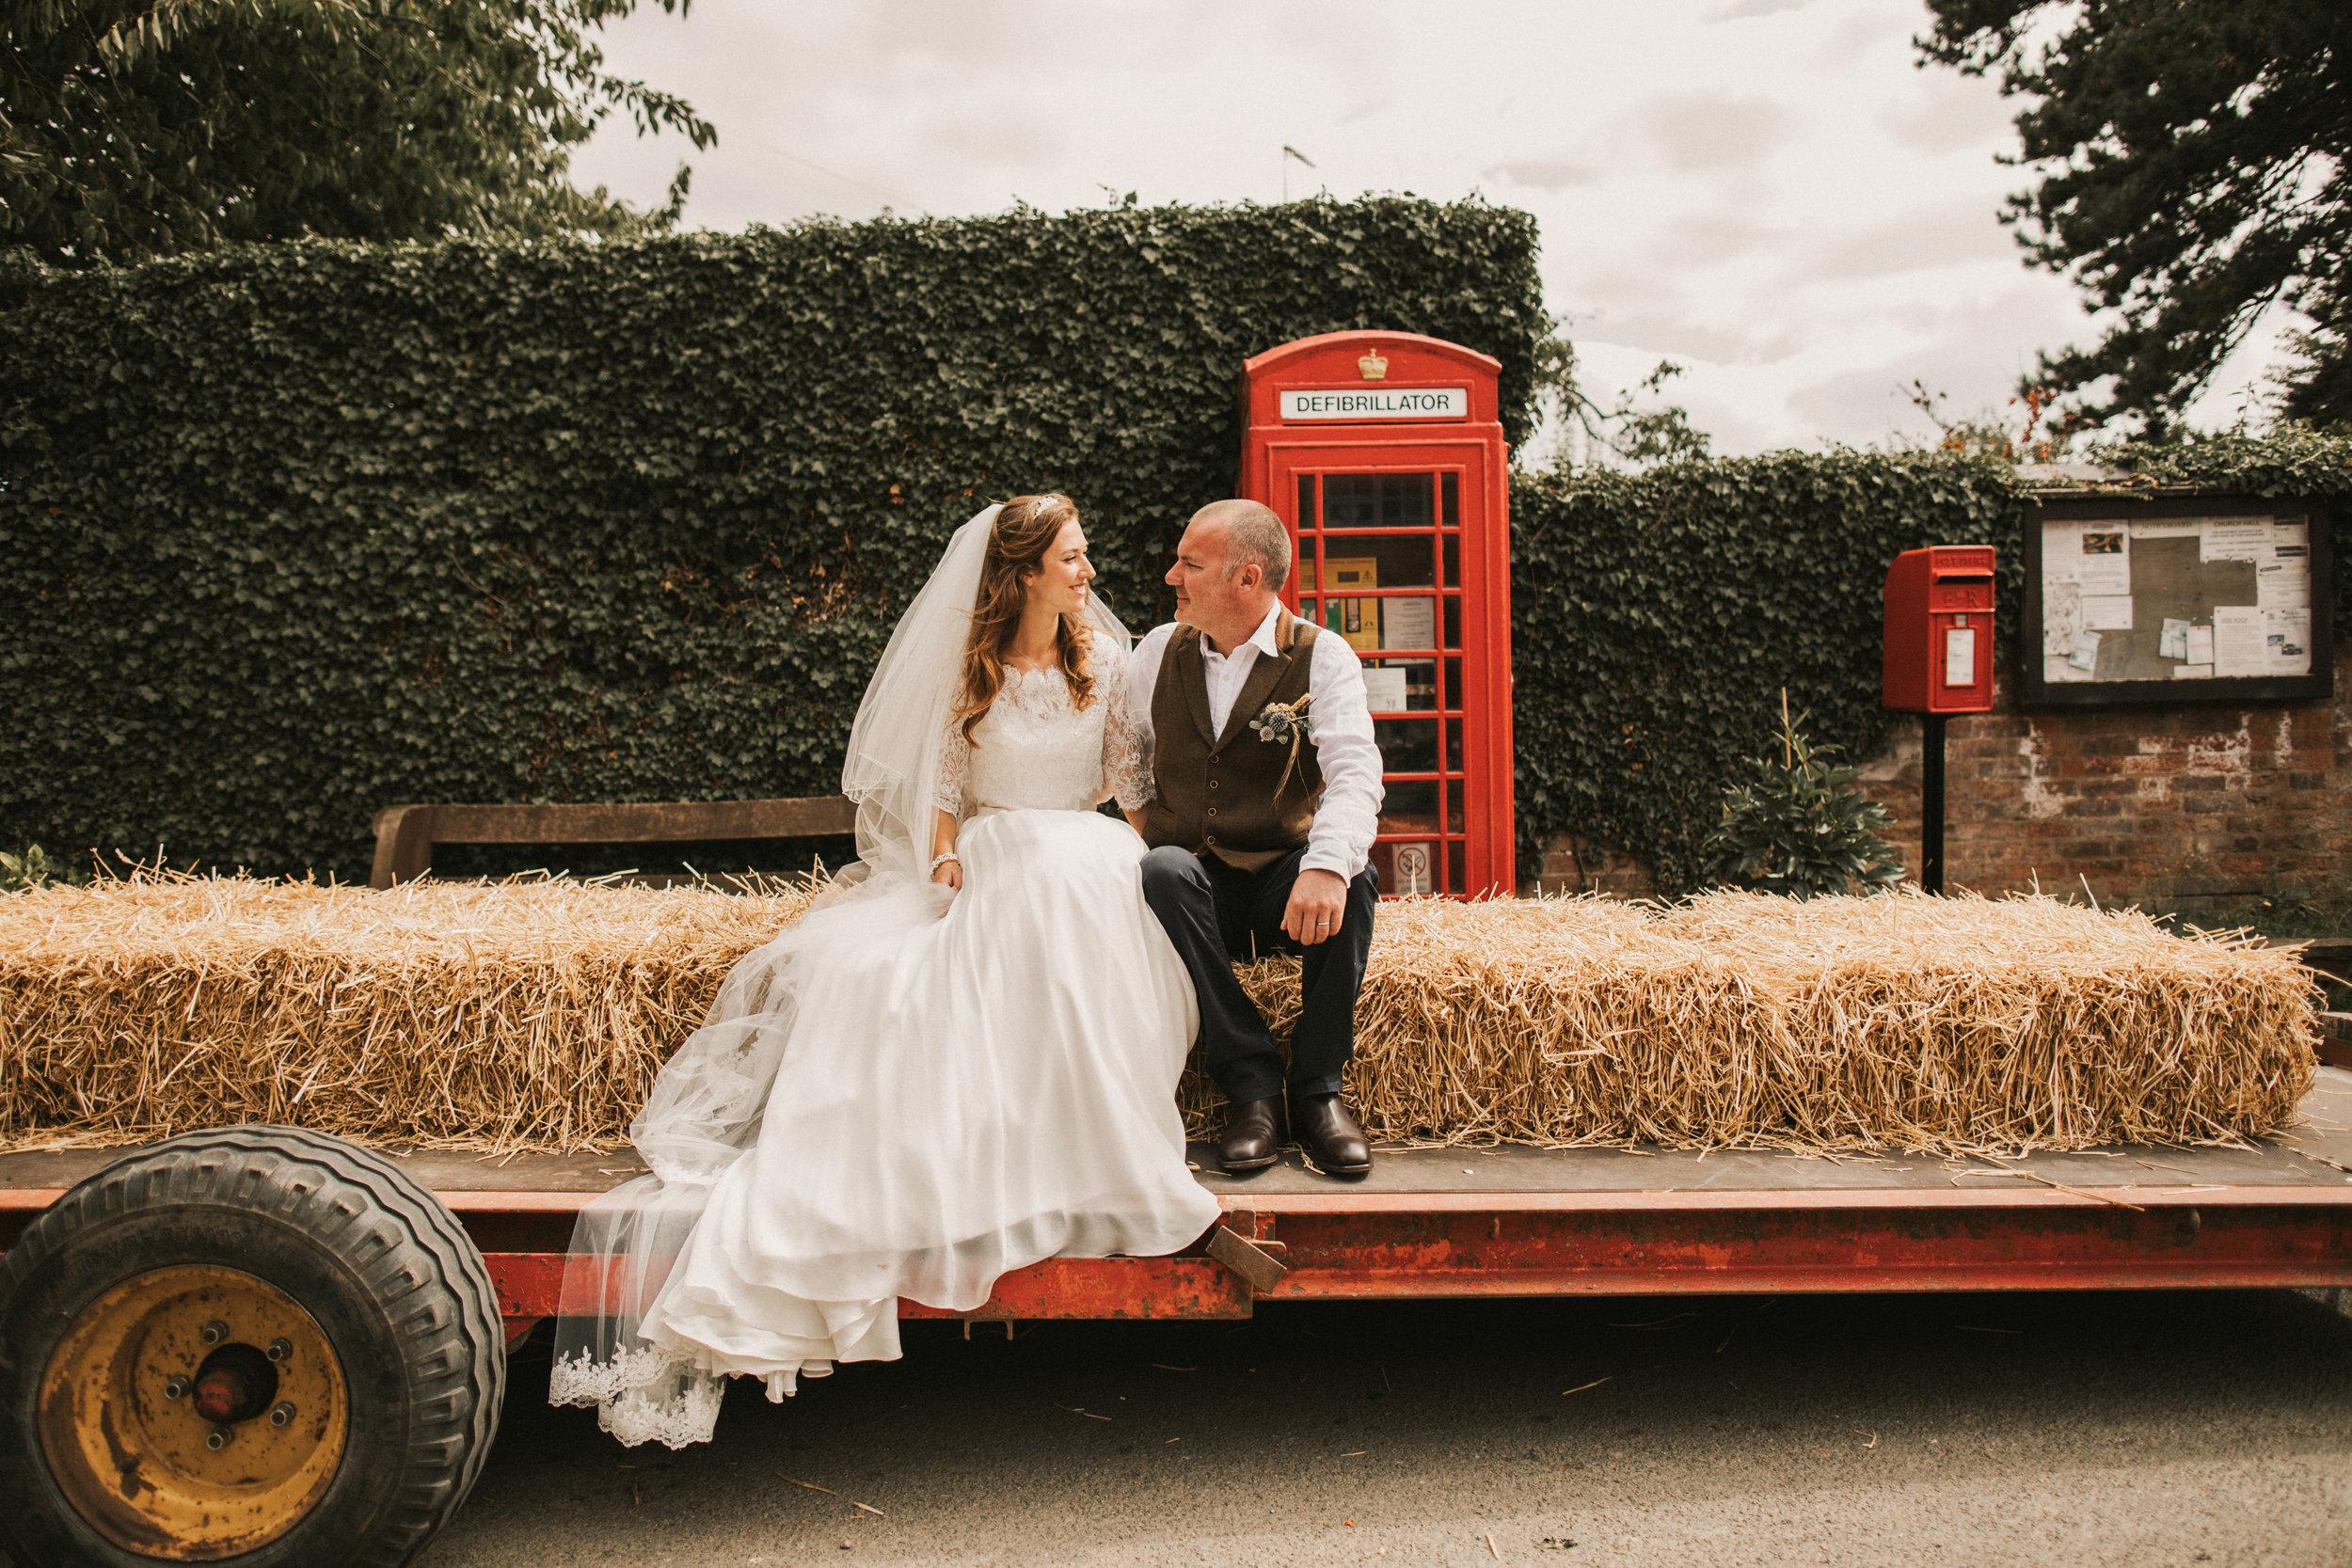 brook rose photography  Farm wedding_181.jpg